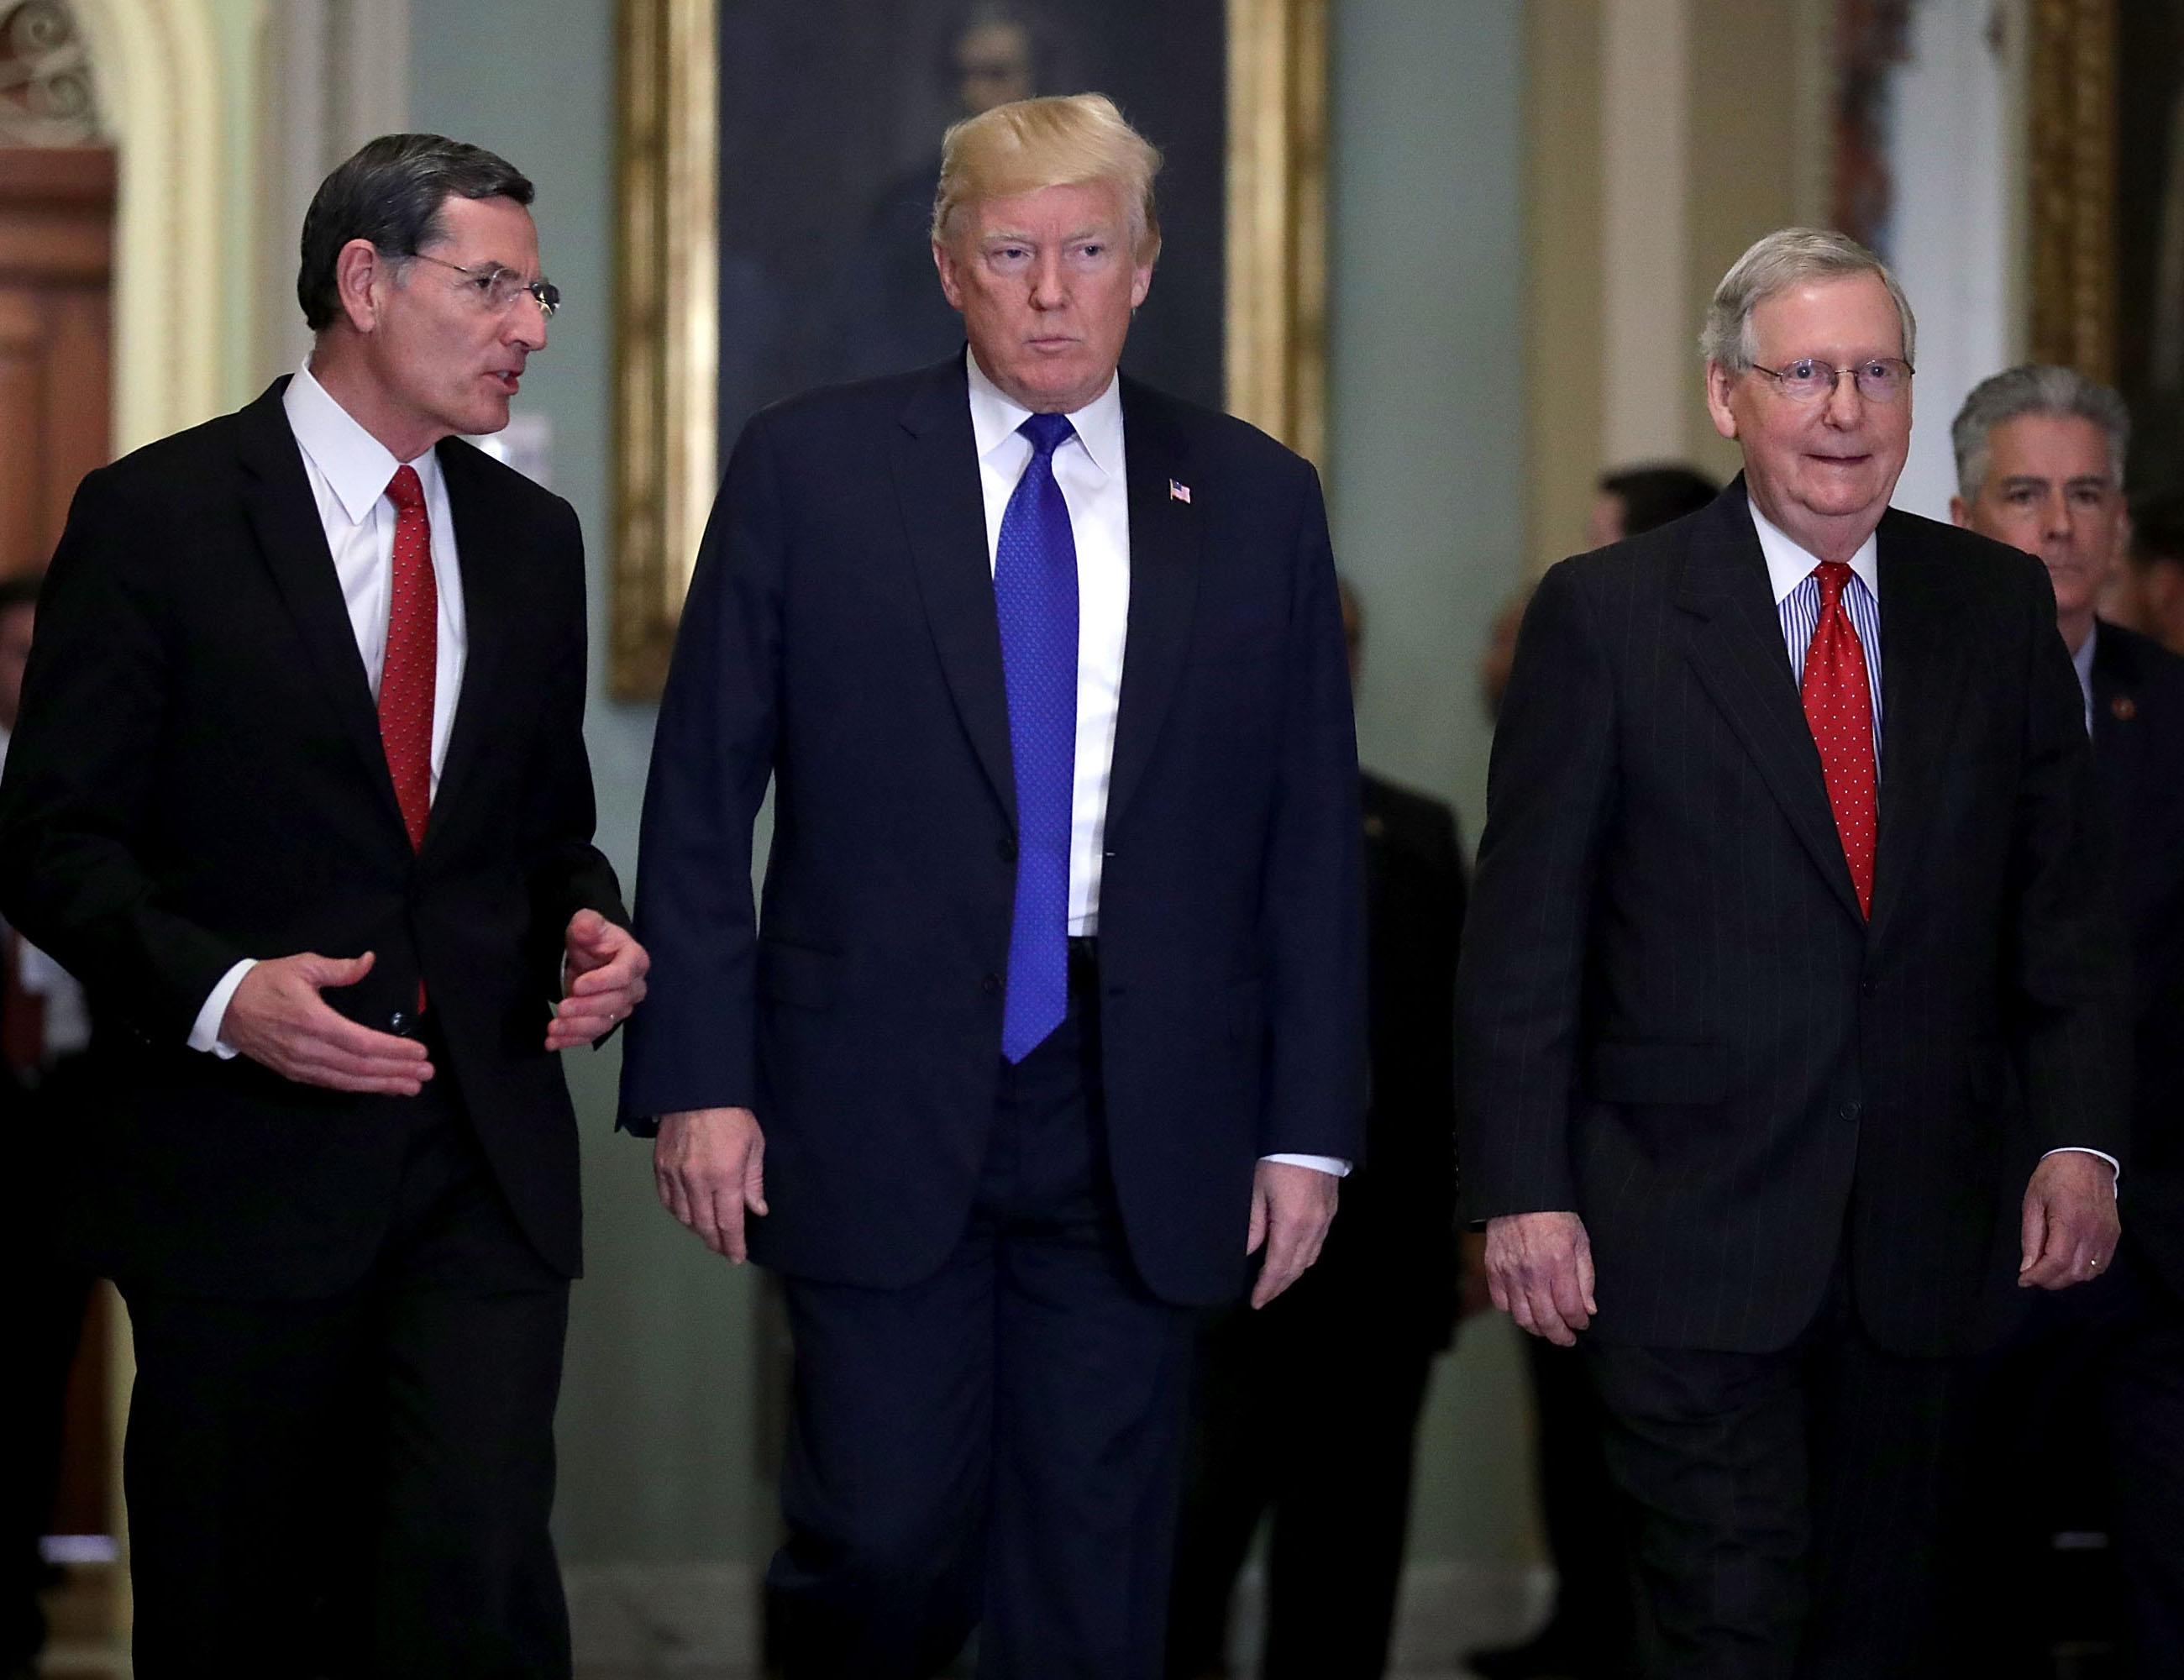 Republicans push tax bill forward, Trump hails GOP 'love fest'